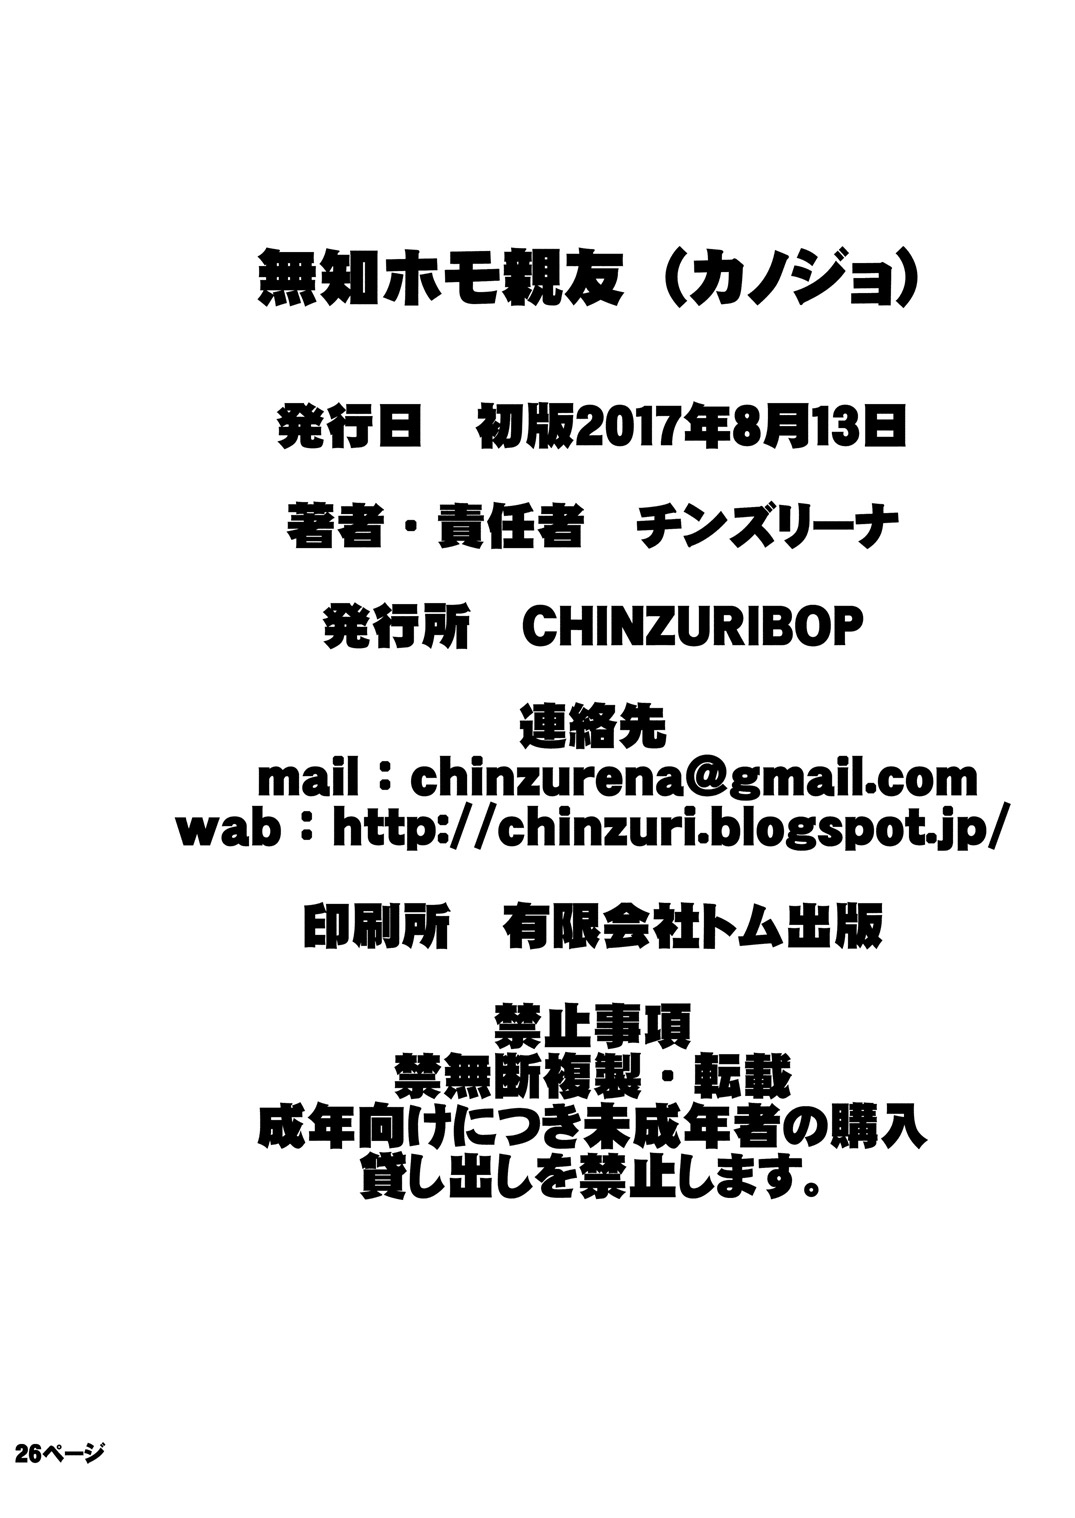 HentaiVN.net - Ảnh 27 - Muchi Homo Kanojo - My Best (Girl) Friend is an Ignorant Homo - Oneshot